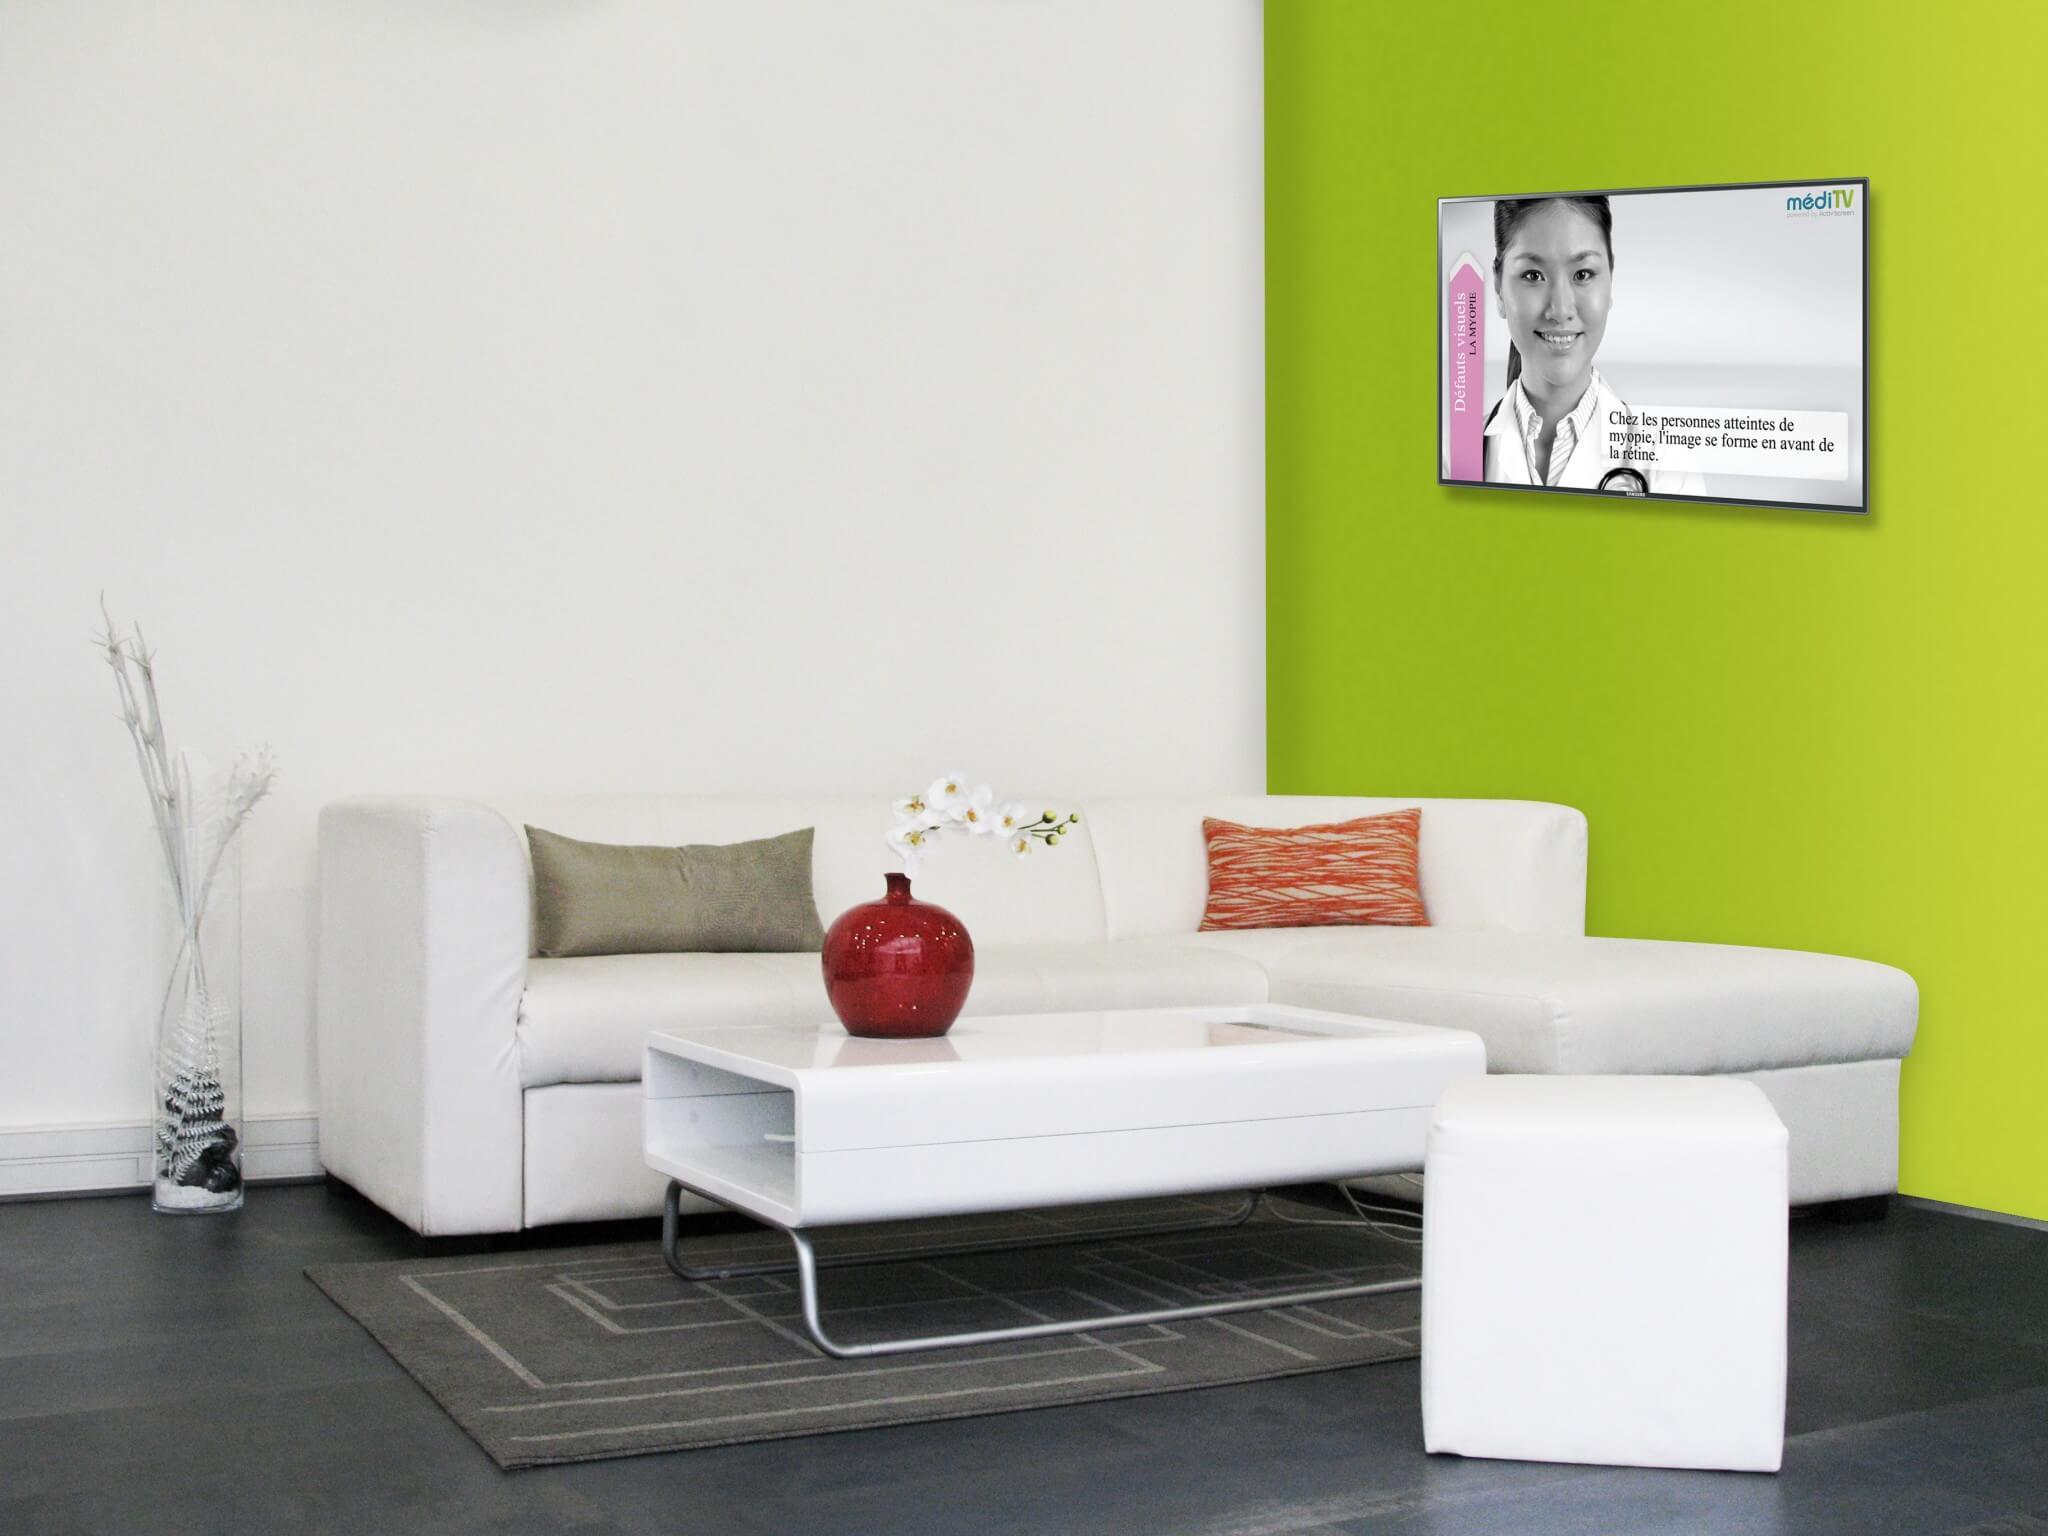 cabinets d 39 ophtalmologie activscreen. Black Bedroom Furniture Sets. Home Design Ideas